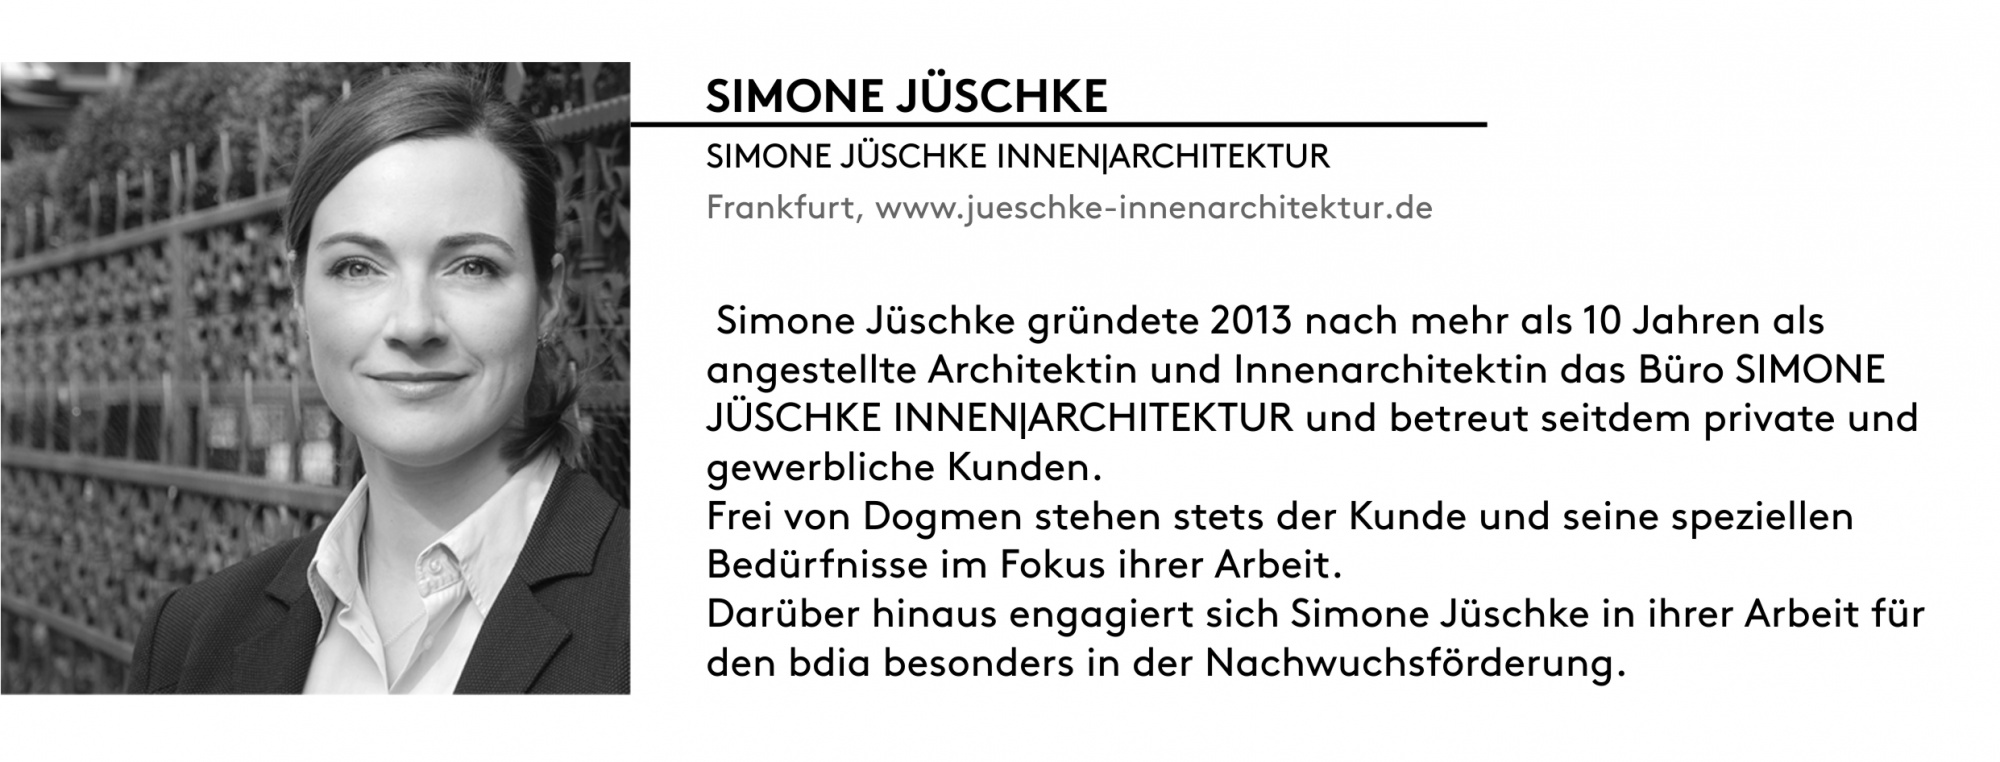 Guide_Simone Jüschke